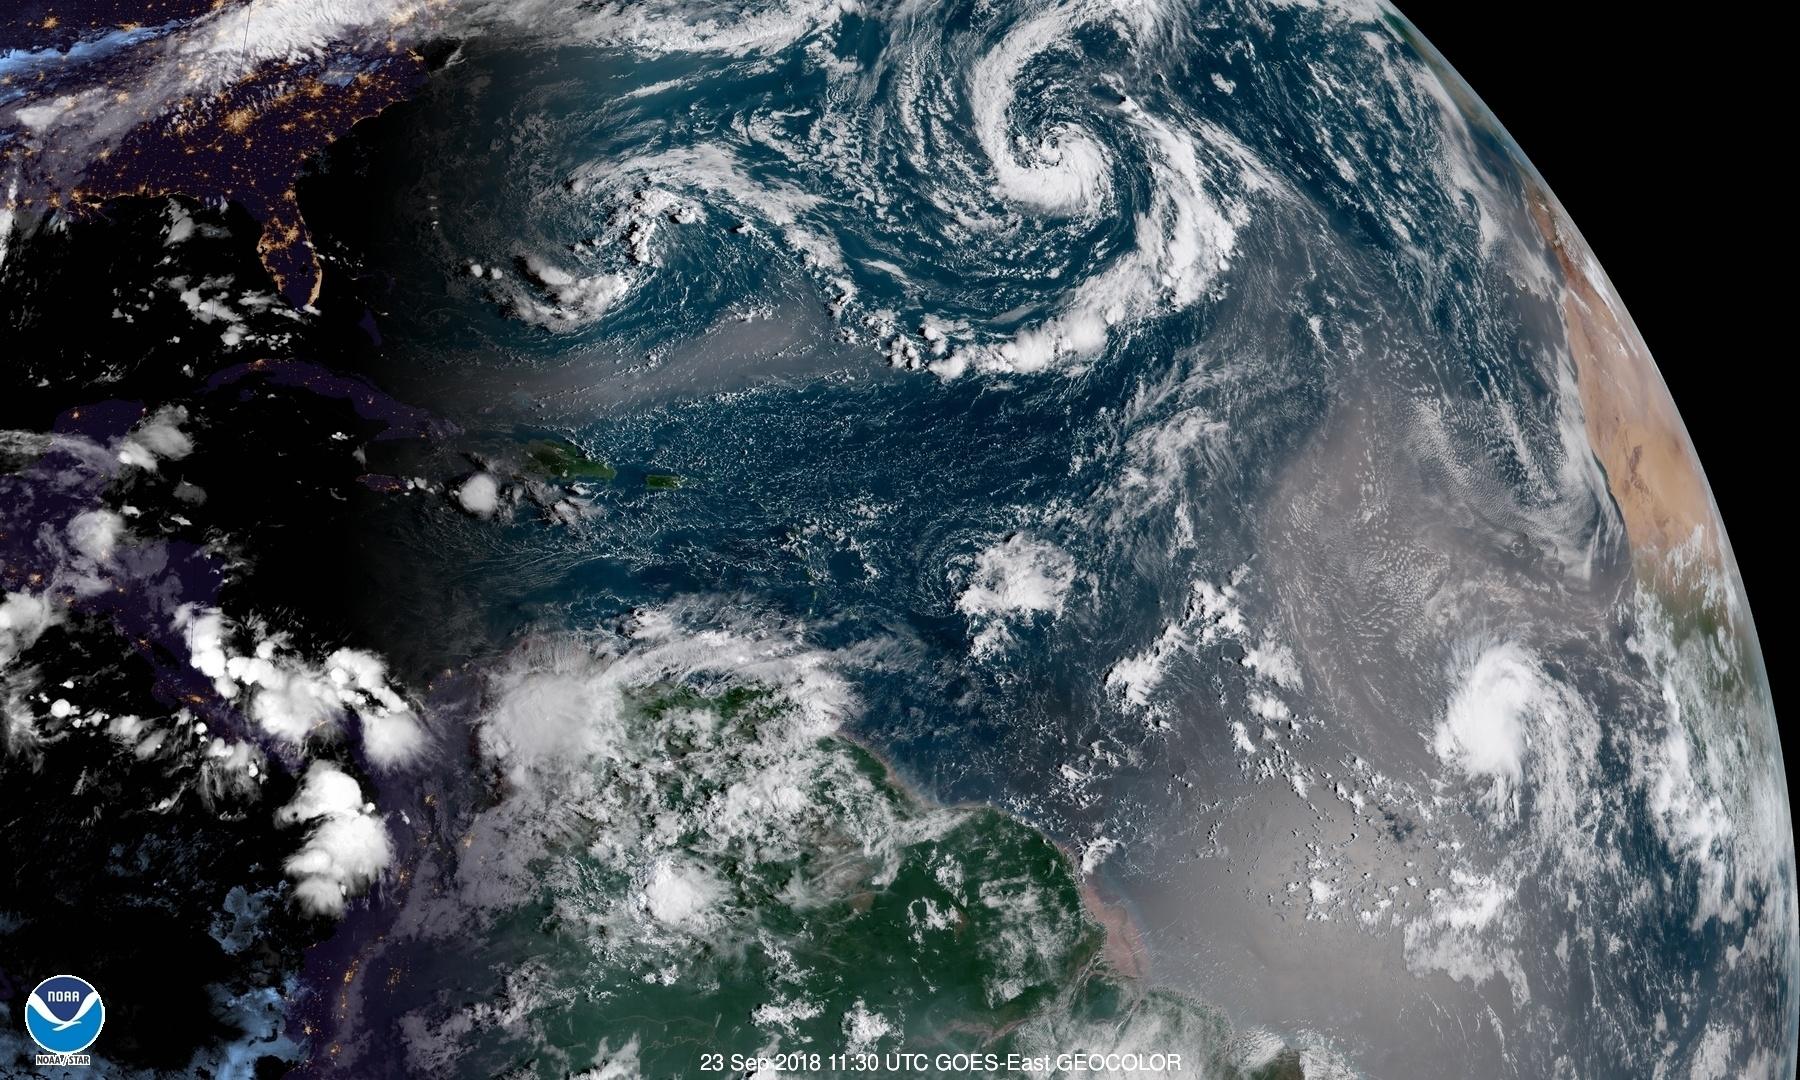 Si risveglia l'Atlantico???-eaad743fb2e3e21c0a71cd54498ef8a410101d0cd1e864545f7c00605104381e.jpg